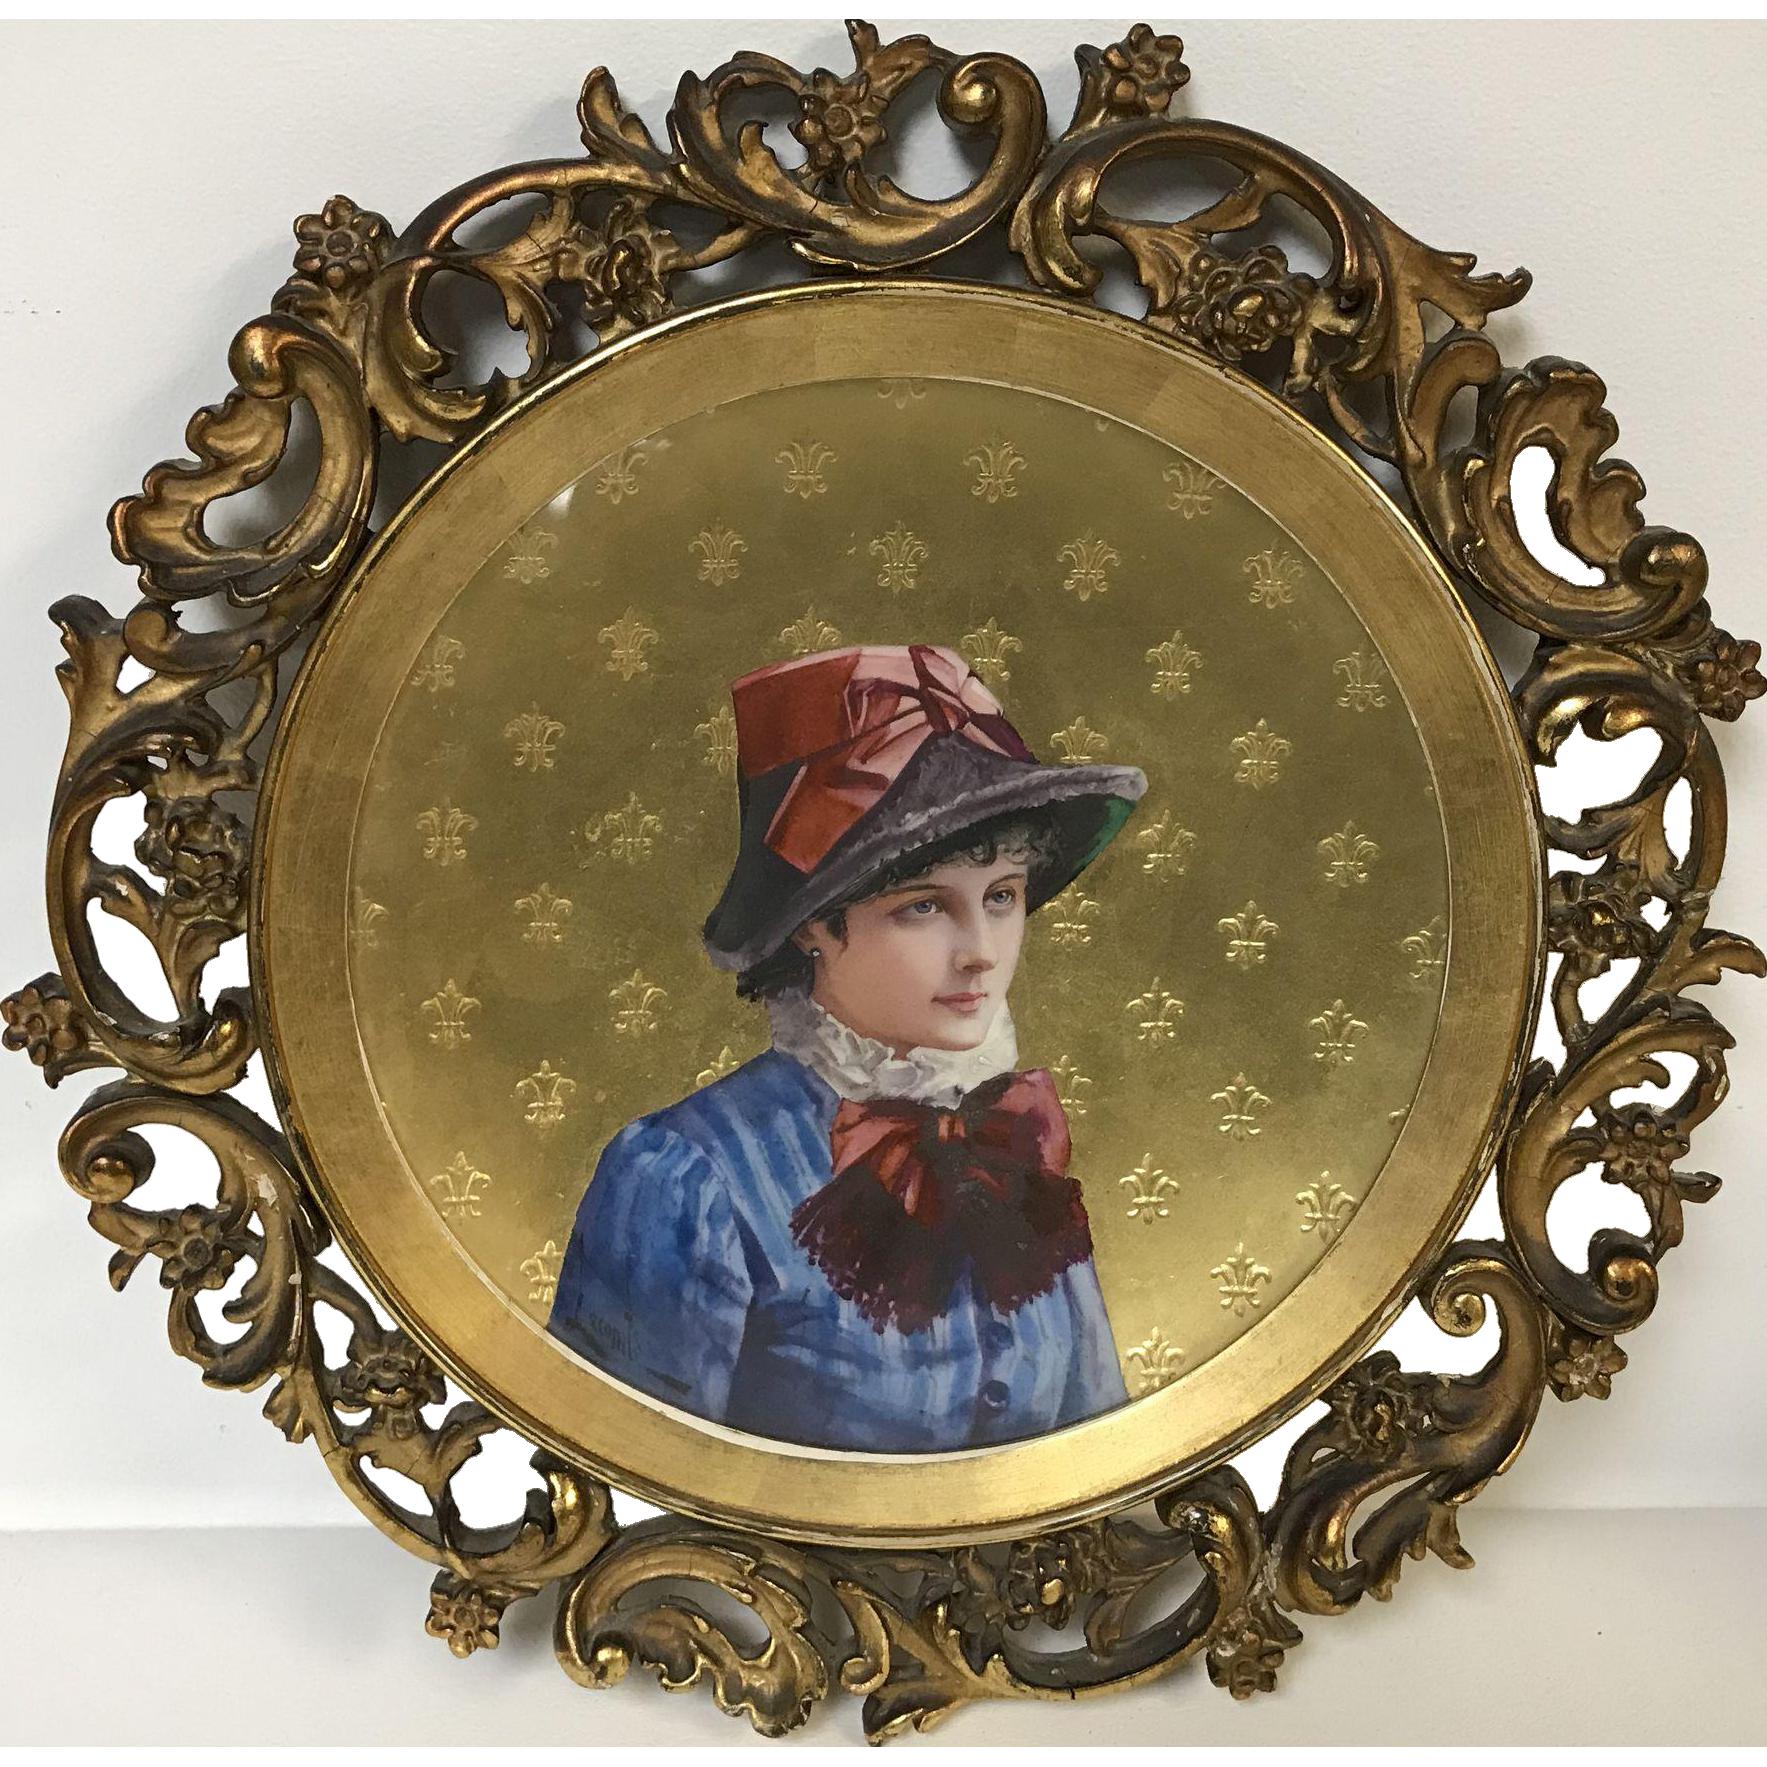 Signed Circa 1840's Fine Paris Porcelain Portrait Plate in Ornate Antique Frame